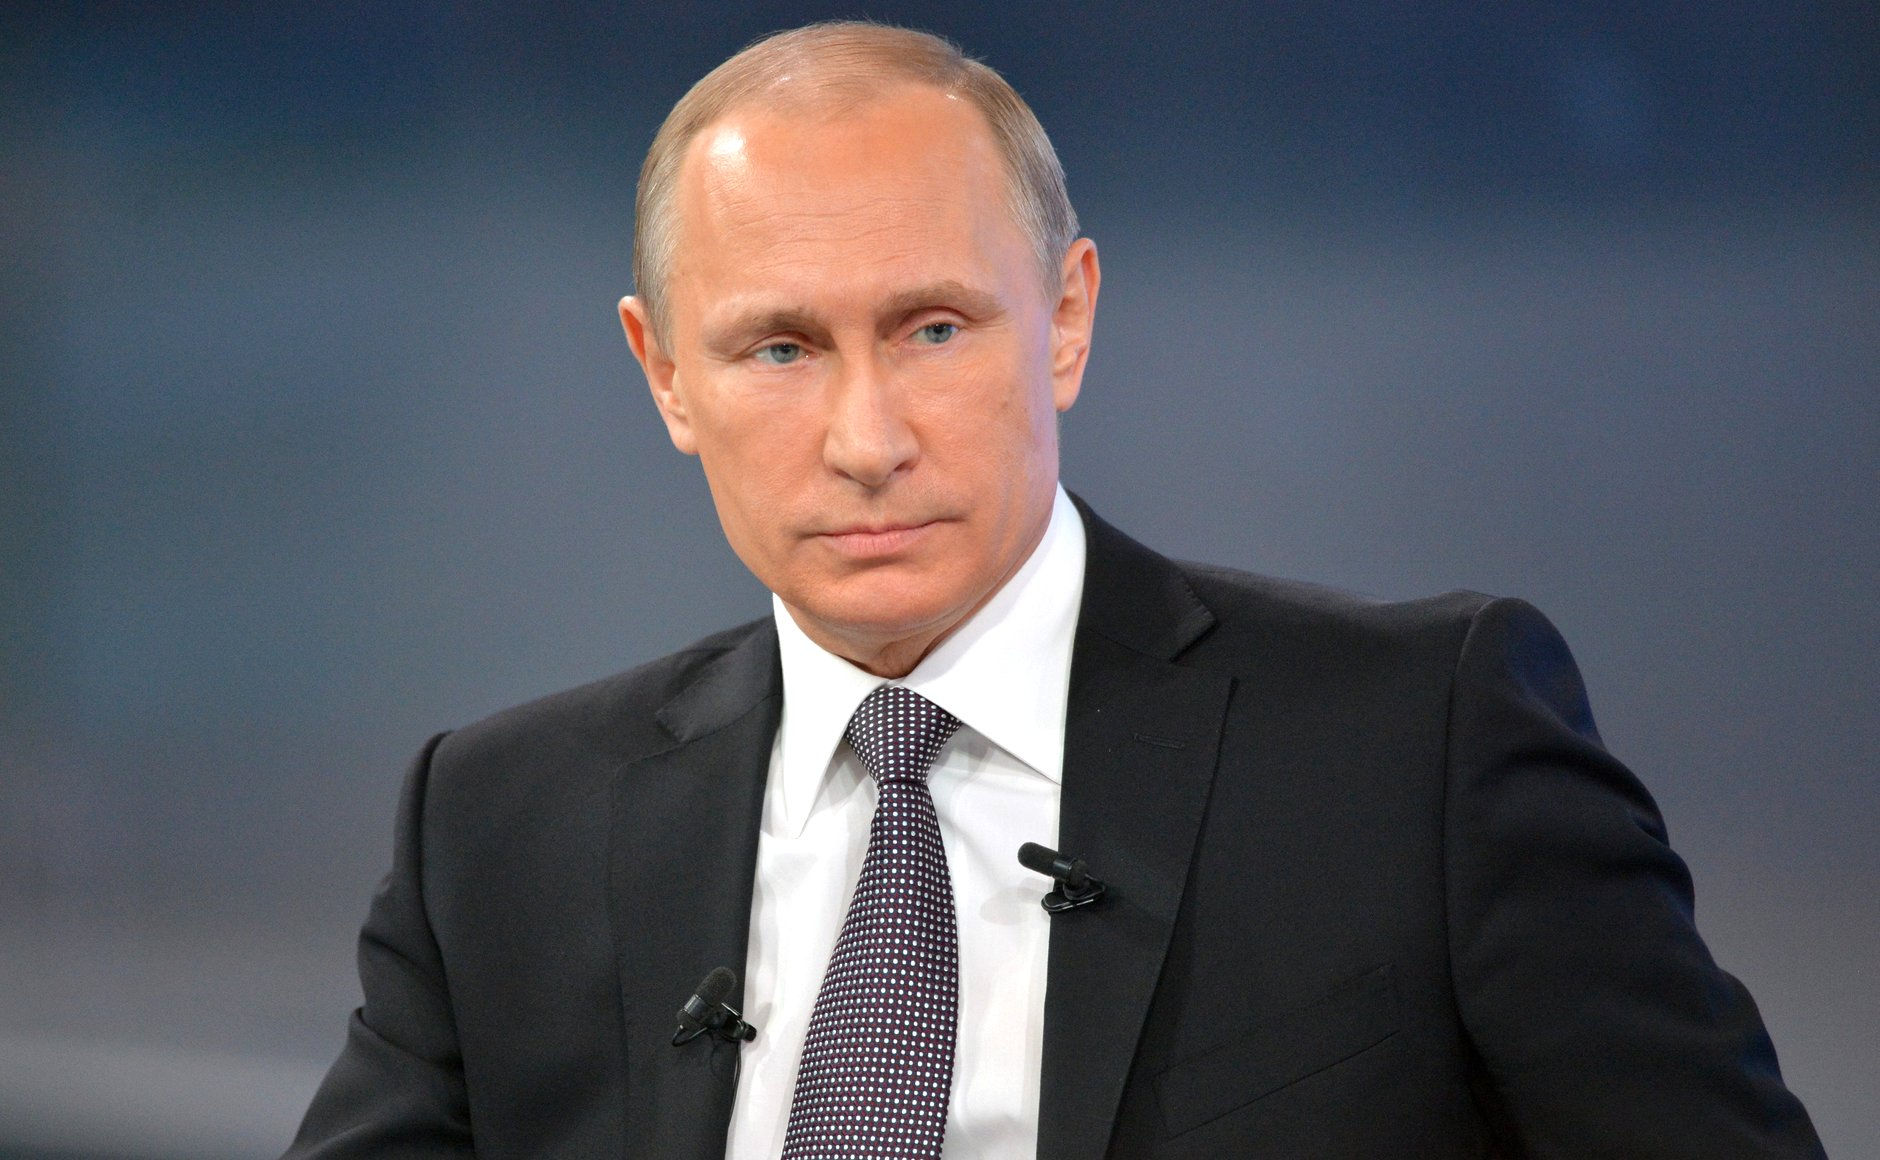 Путин подписал указ во выполнение резолюции Совбеза ООН осанкциях против КНДР